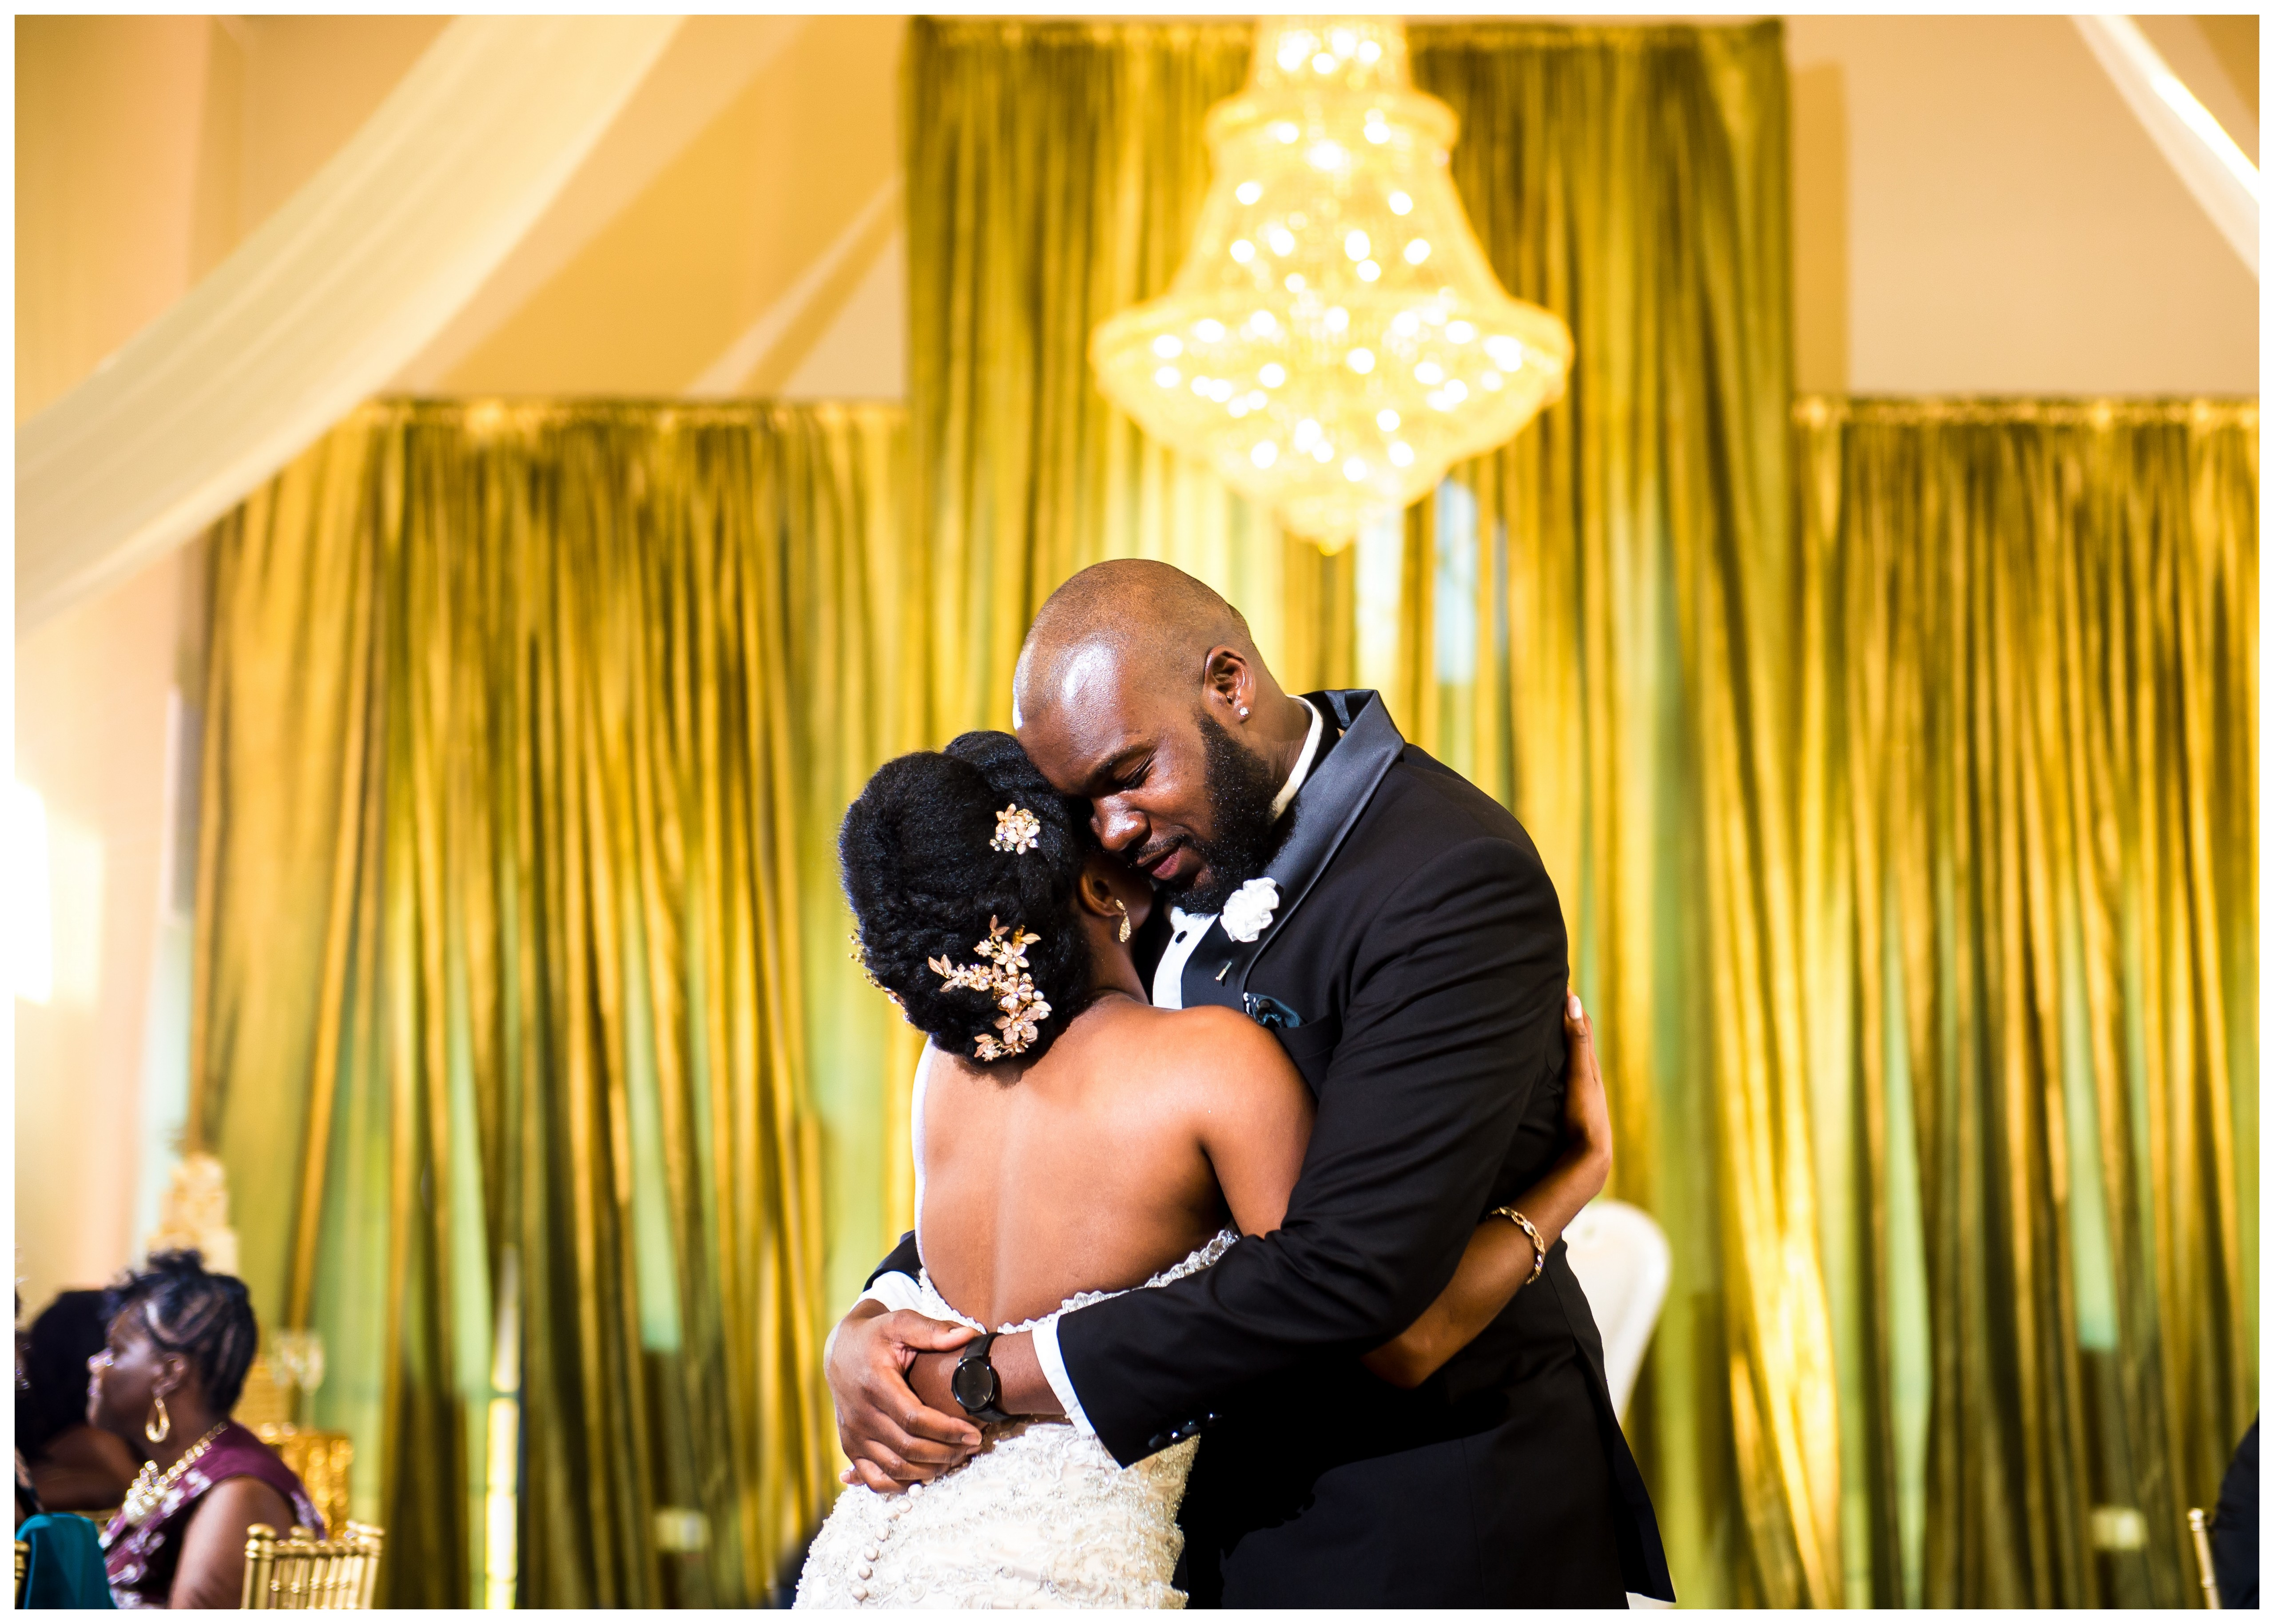 LIVE_FINAL_WEDDING_SEAN_AFTON6